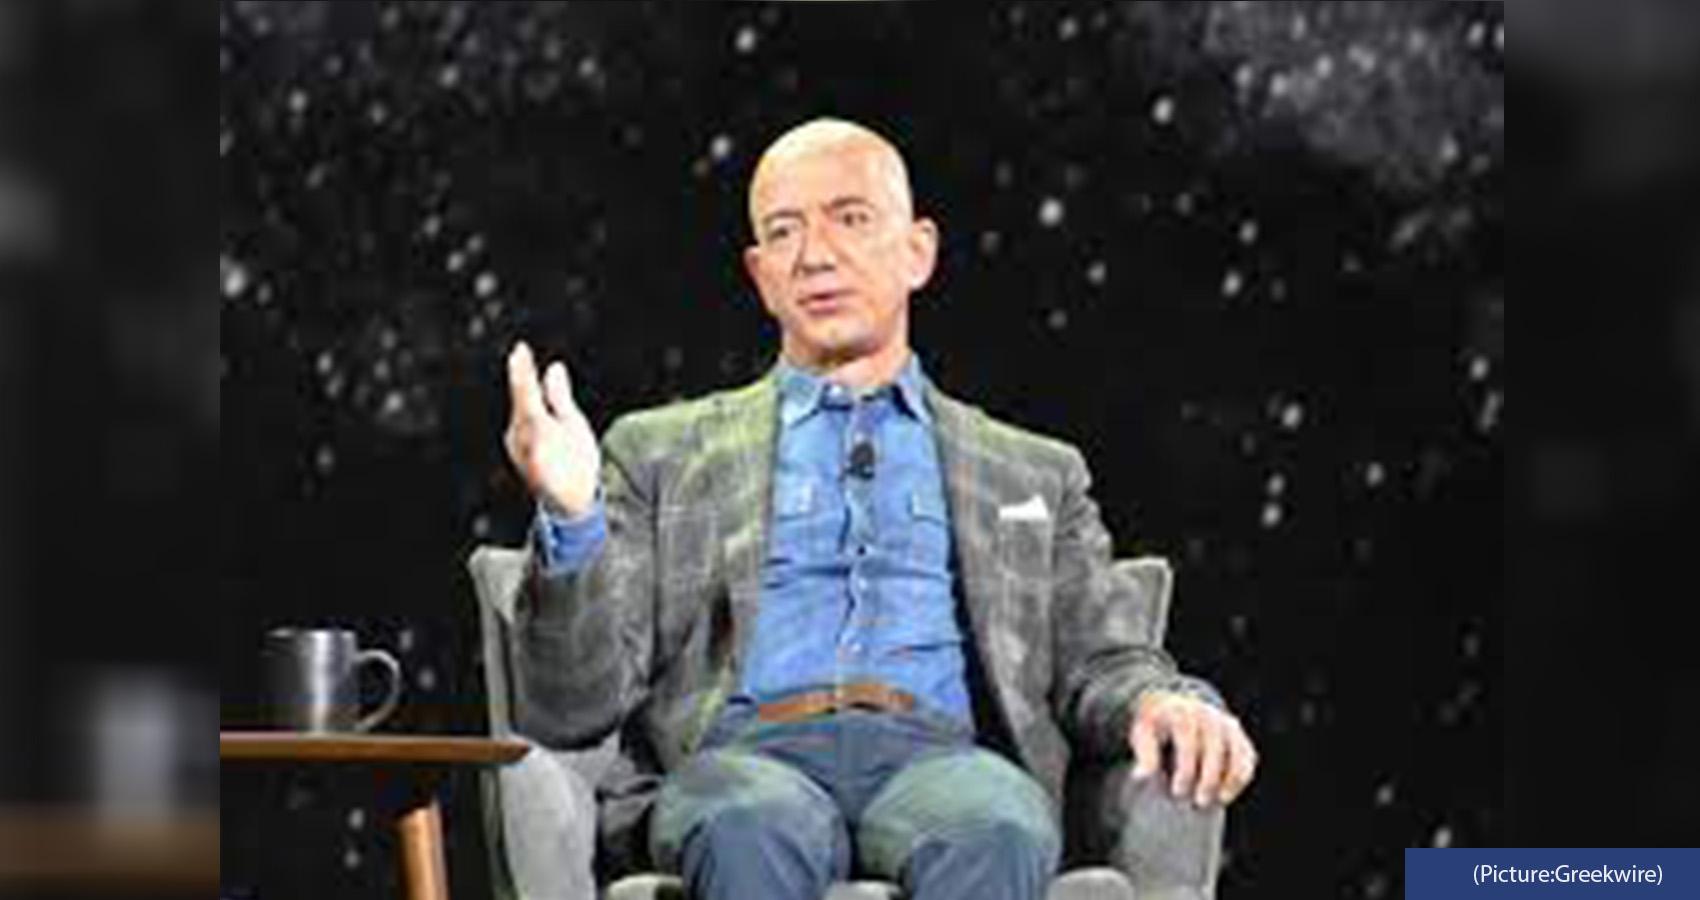 As Amazon Stocks Stumble, Jeff Bezos Loses Title As Richest Person On The Planet